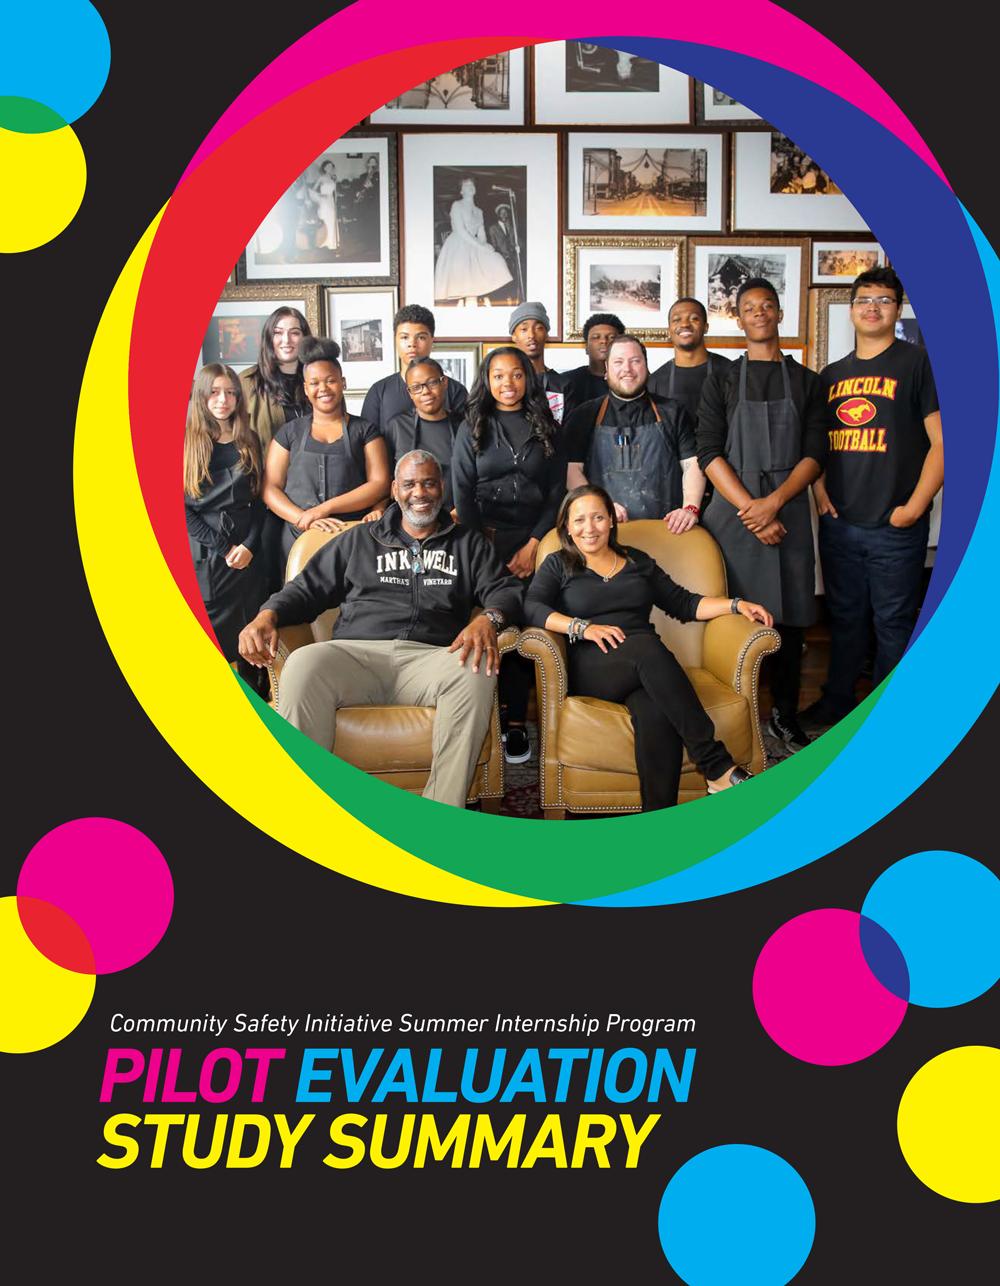 2017 CSI Summer Internship Program - Pilot Evaluation Study